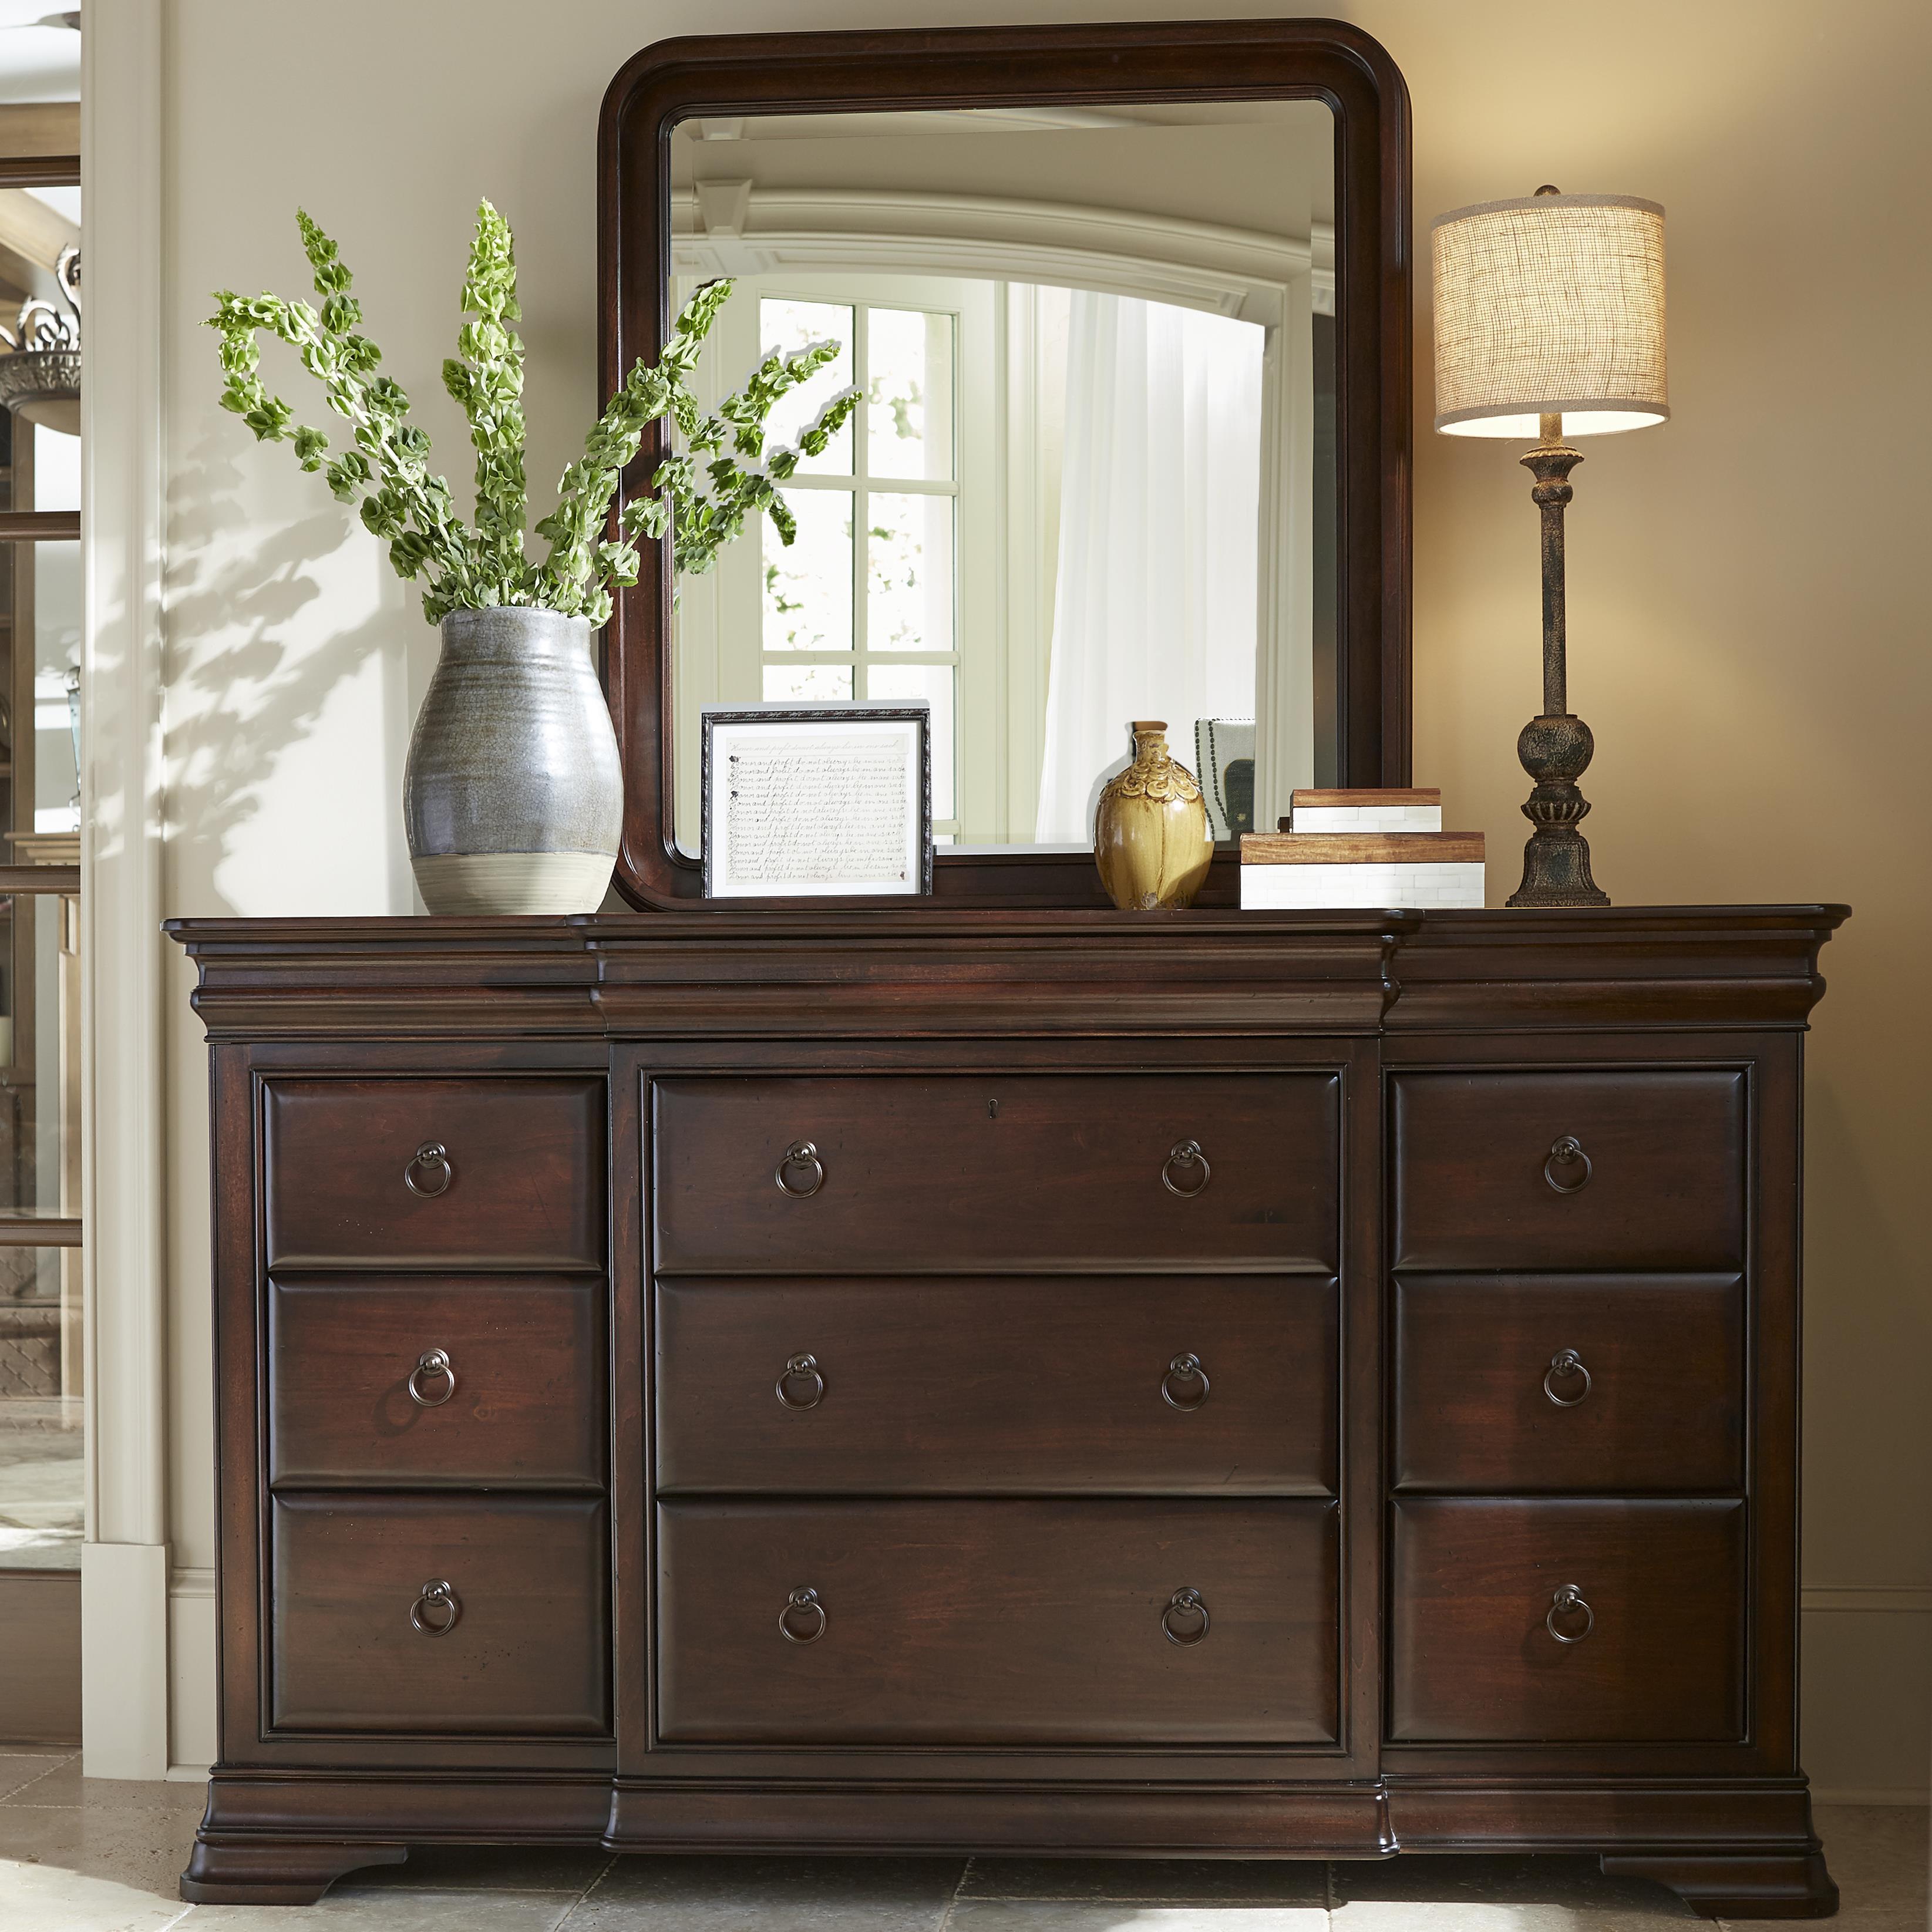 Morris Home Newton Falls Dresser and Mirror - Item Number: 581040+58104M